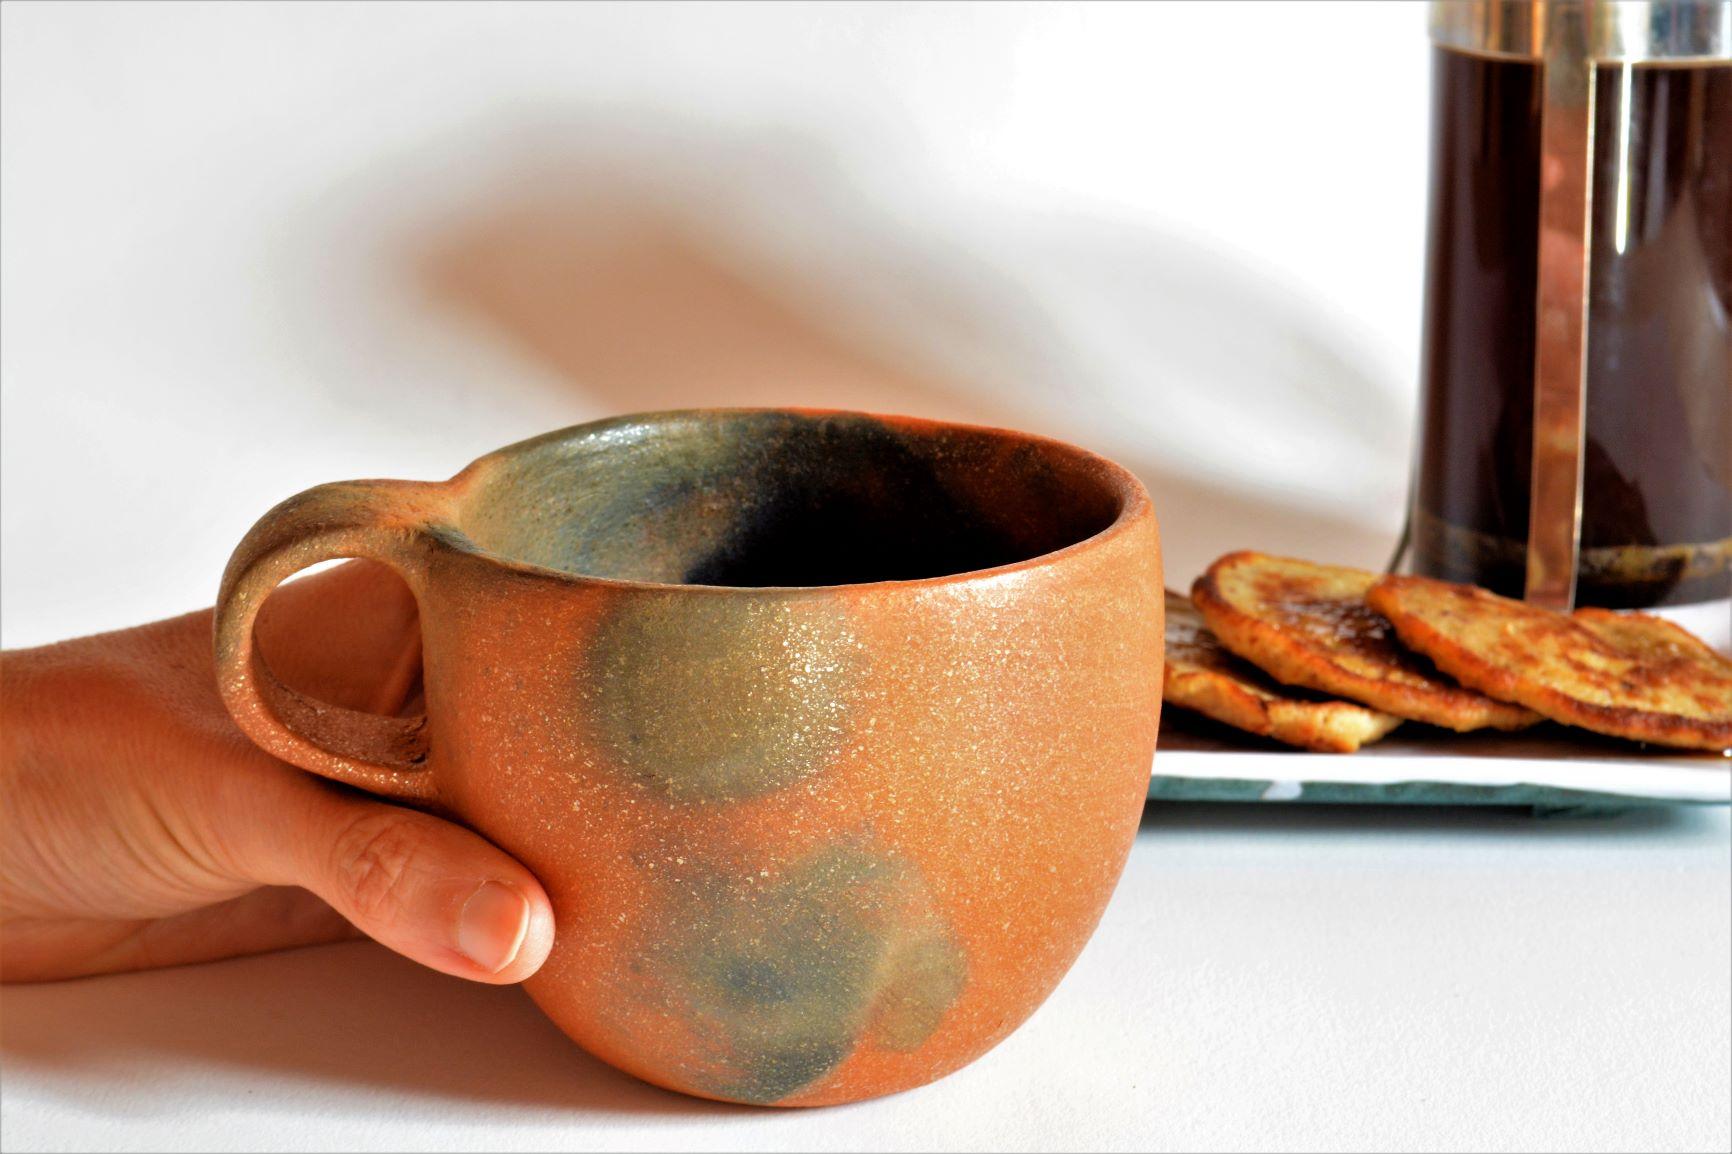 Coffee Mug with Breakfast .JPG